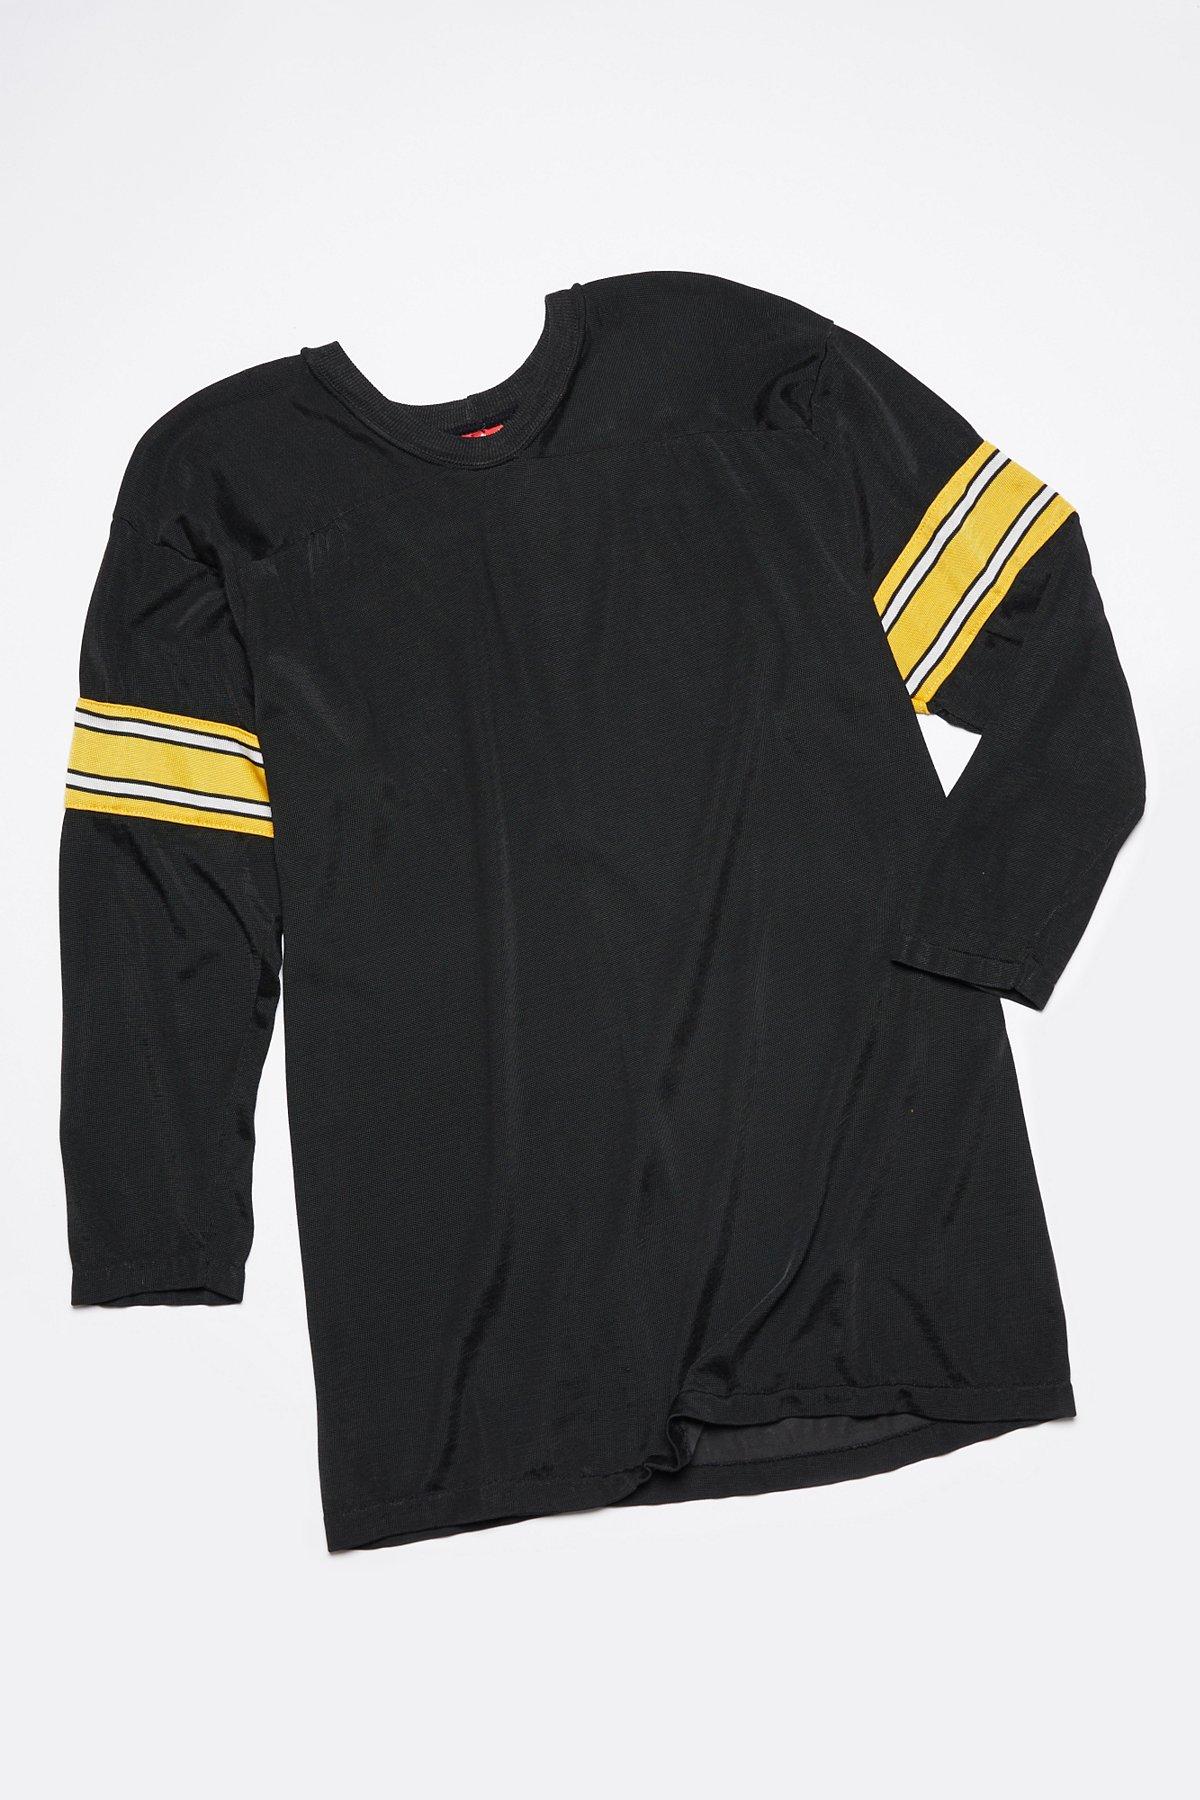 Vintage 1970s Long Sleeve Jersey